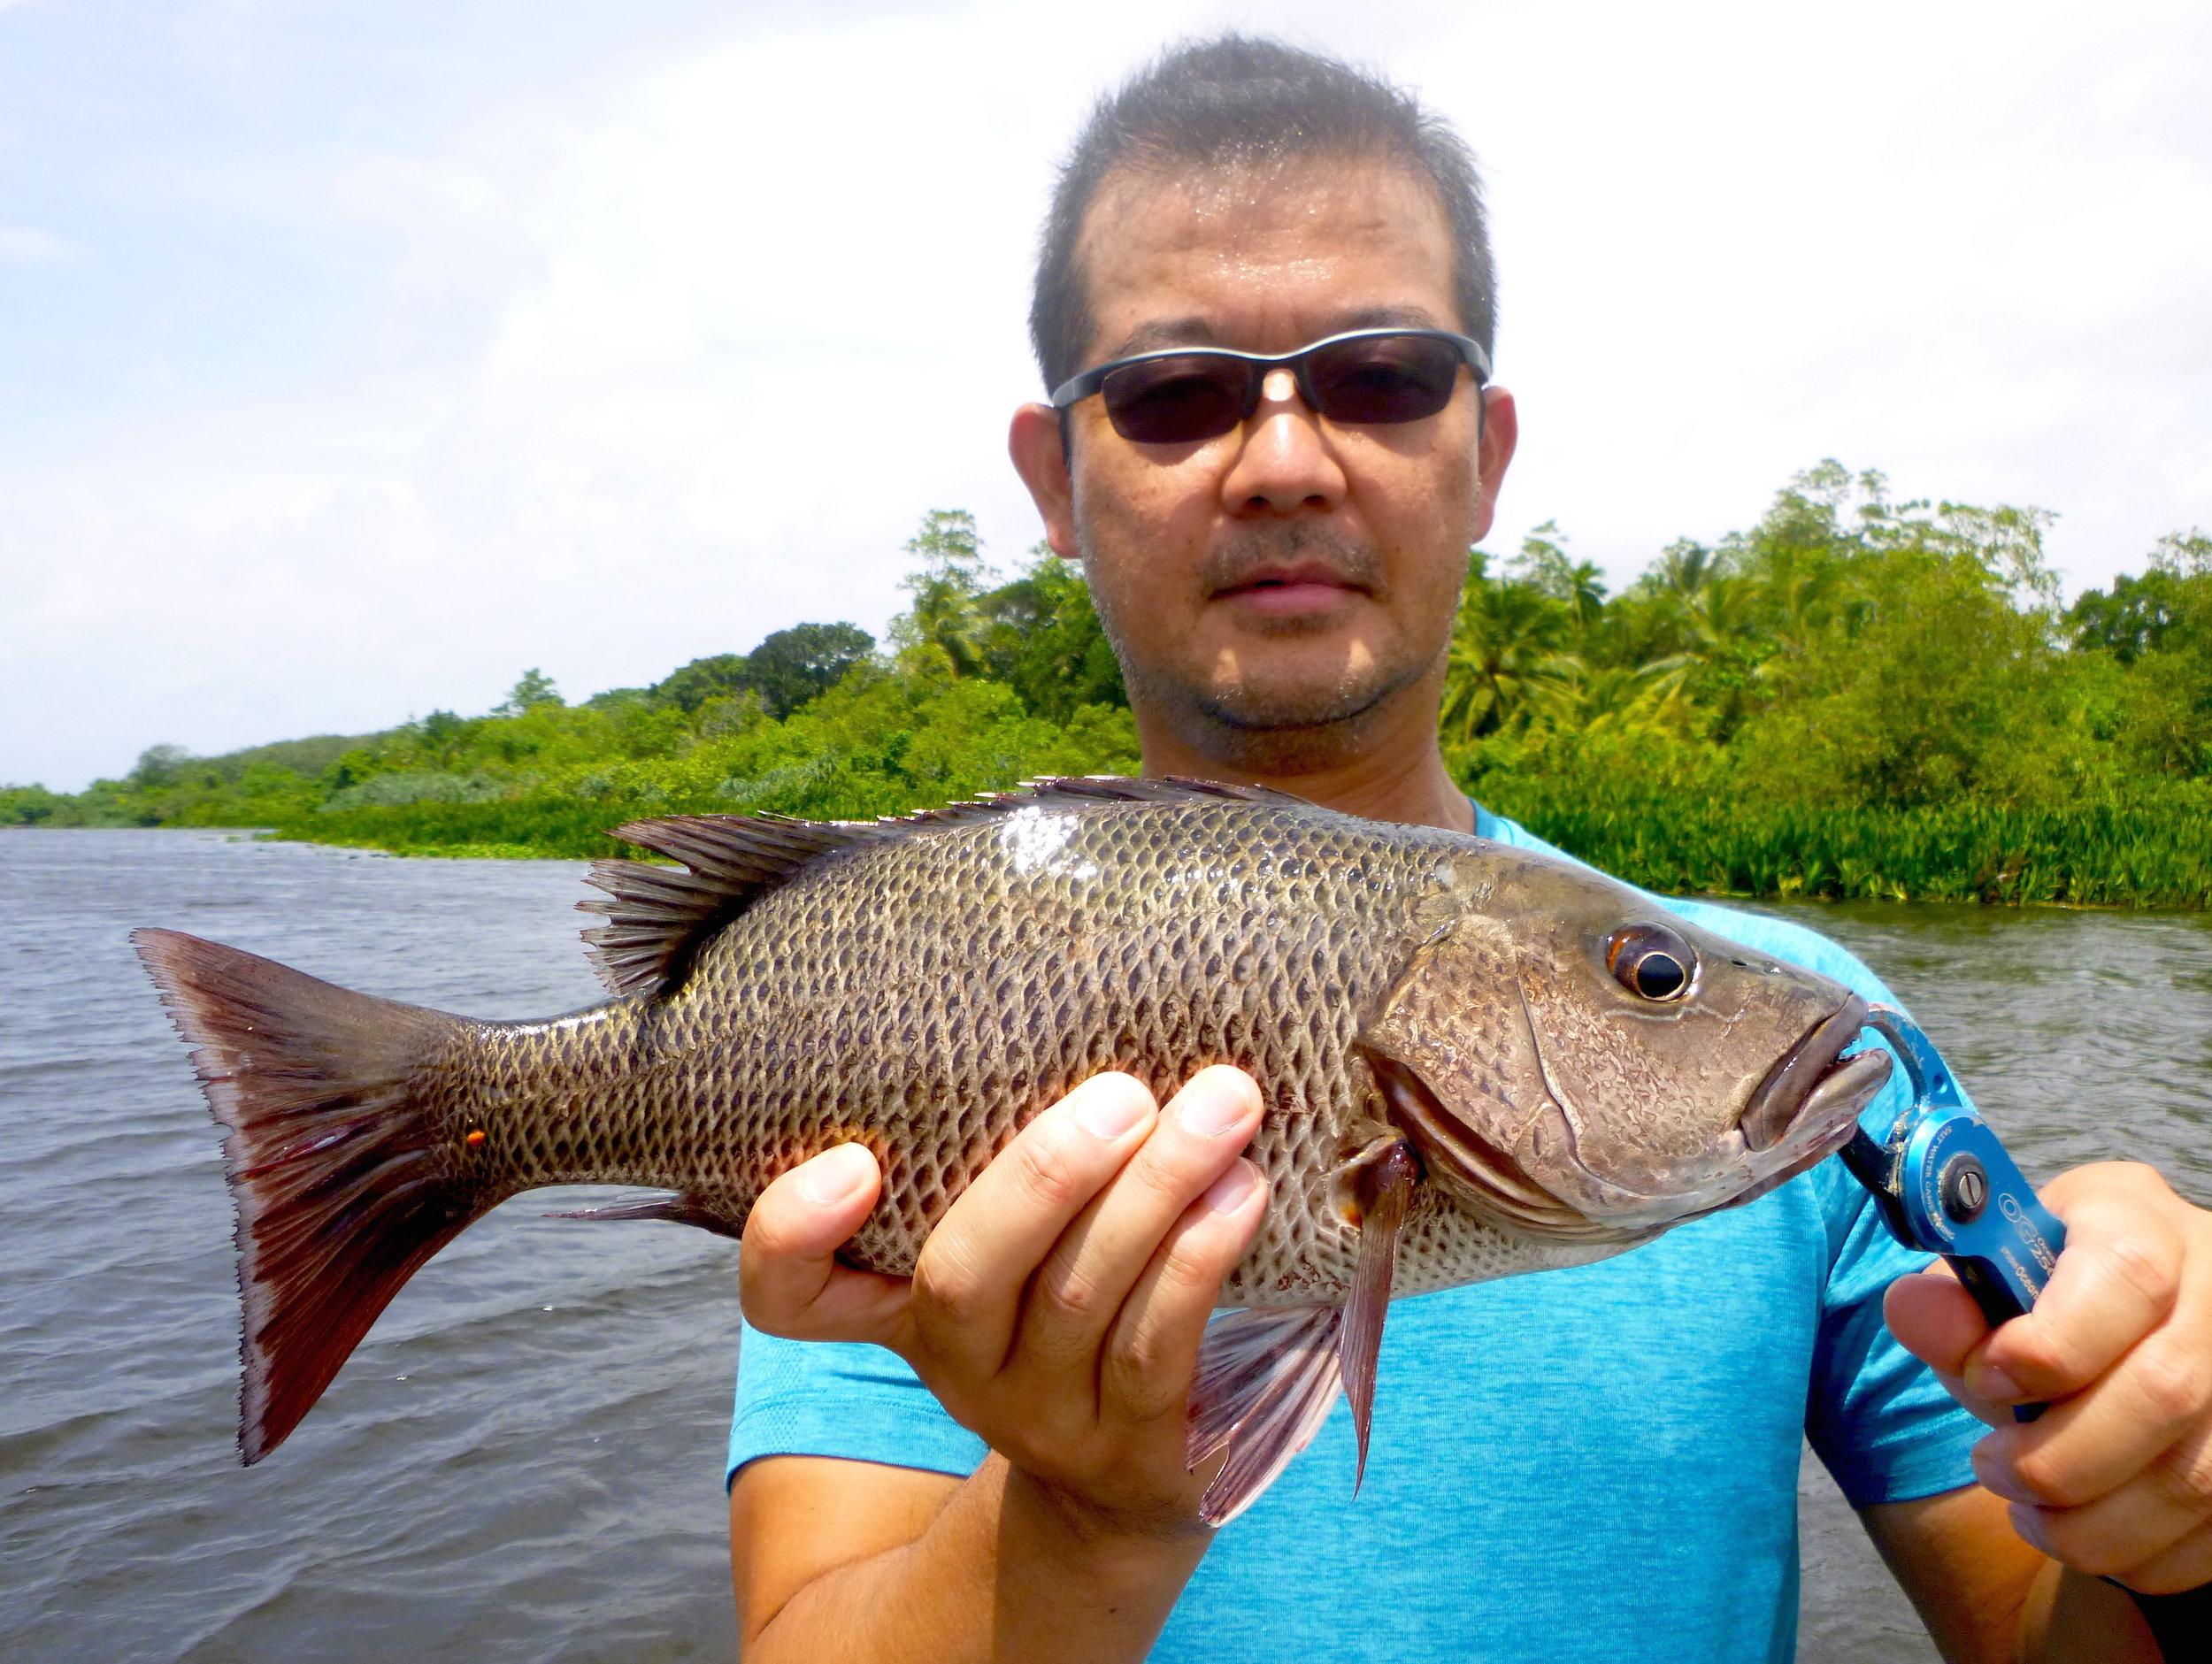 Sportfishing Lanka Bolgoda Lake Feisty Mangrove Jack .JPG